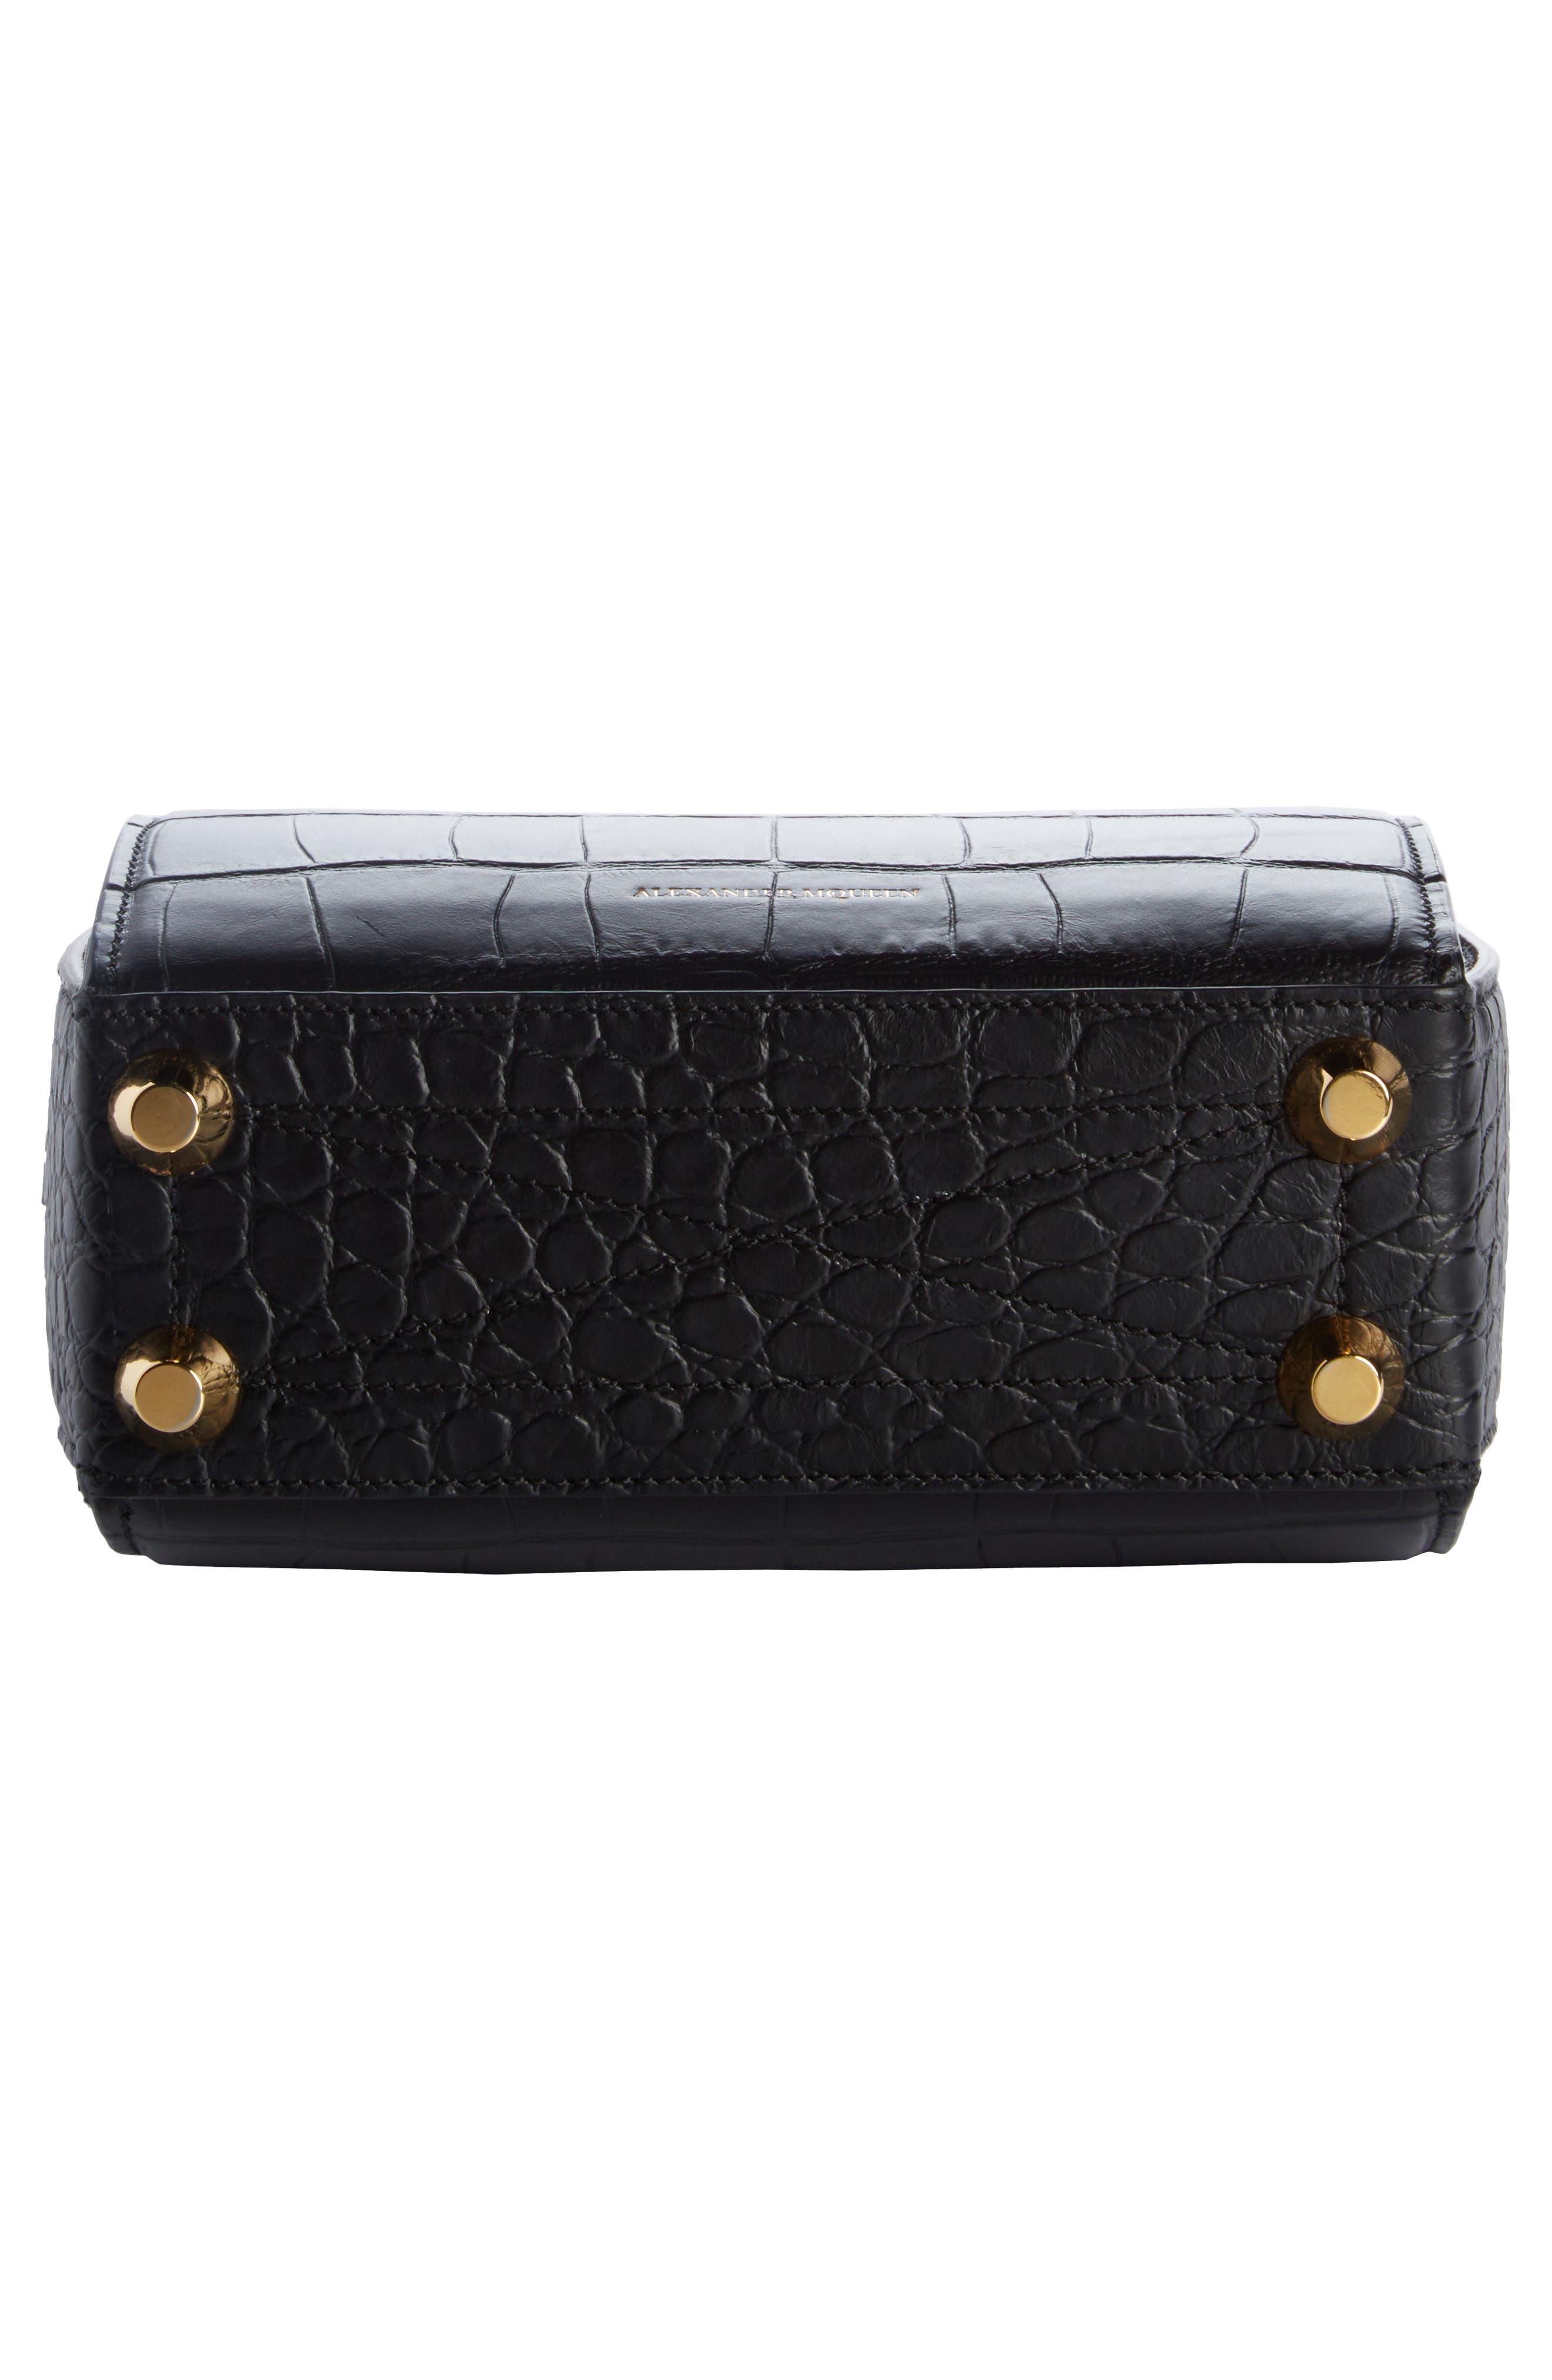 Box Bag 19 Croc Embossed Leather Bag,                             Alternate thumbnail 7, color,